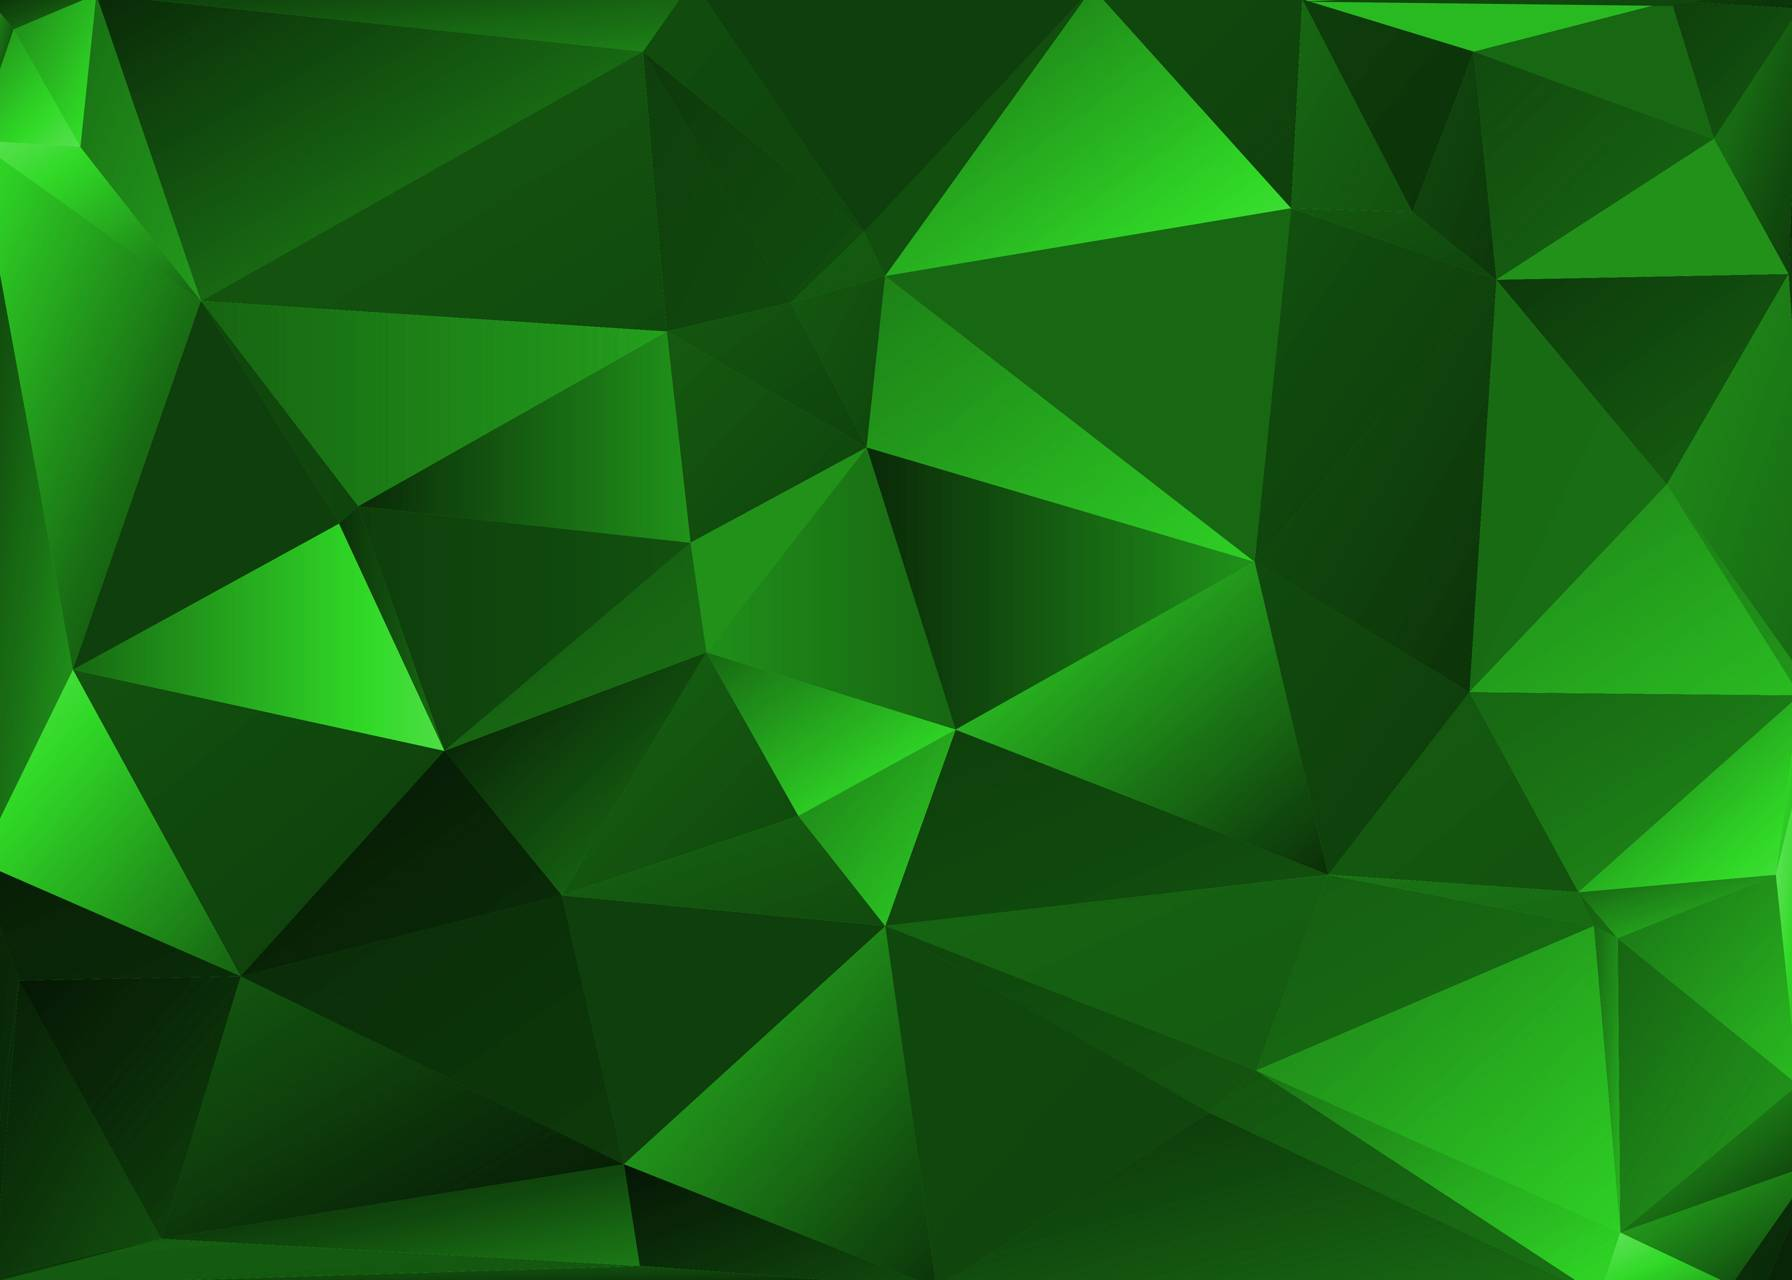 Green Polygon